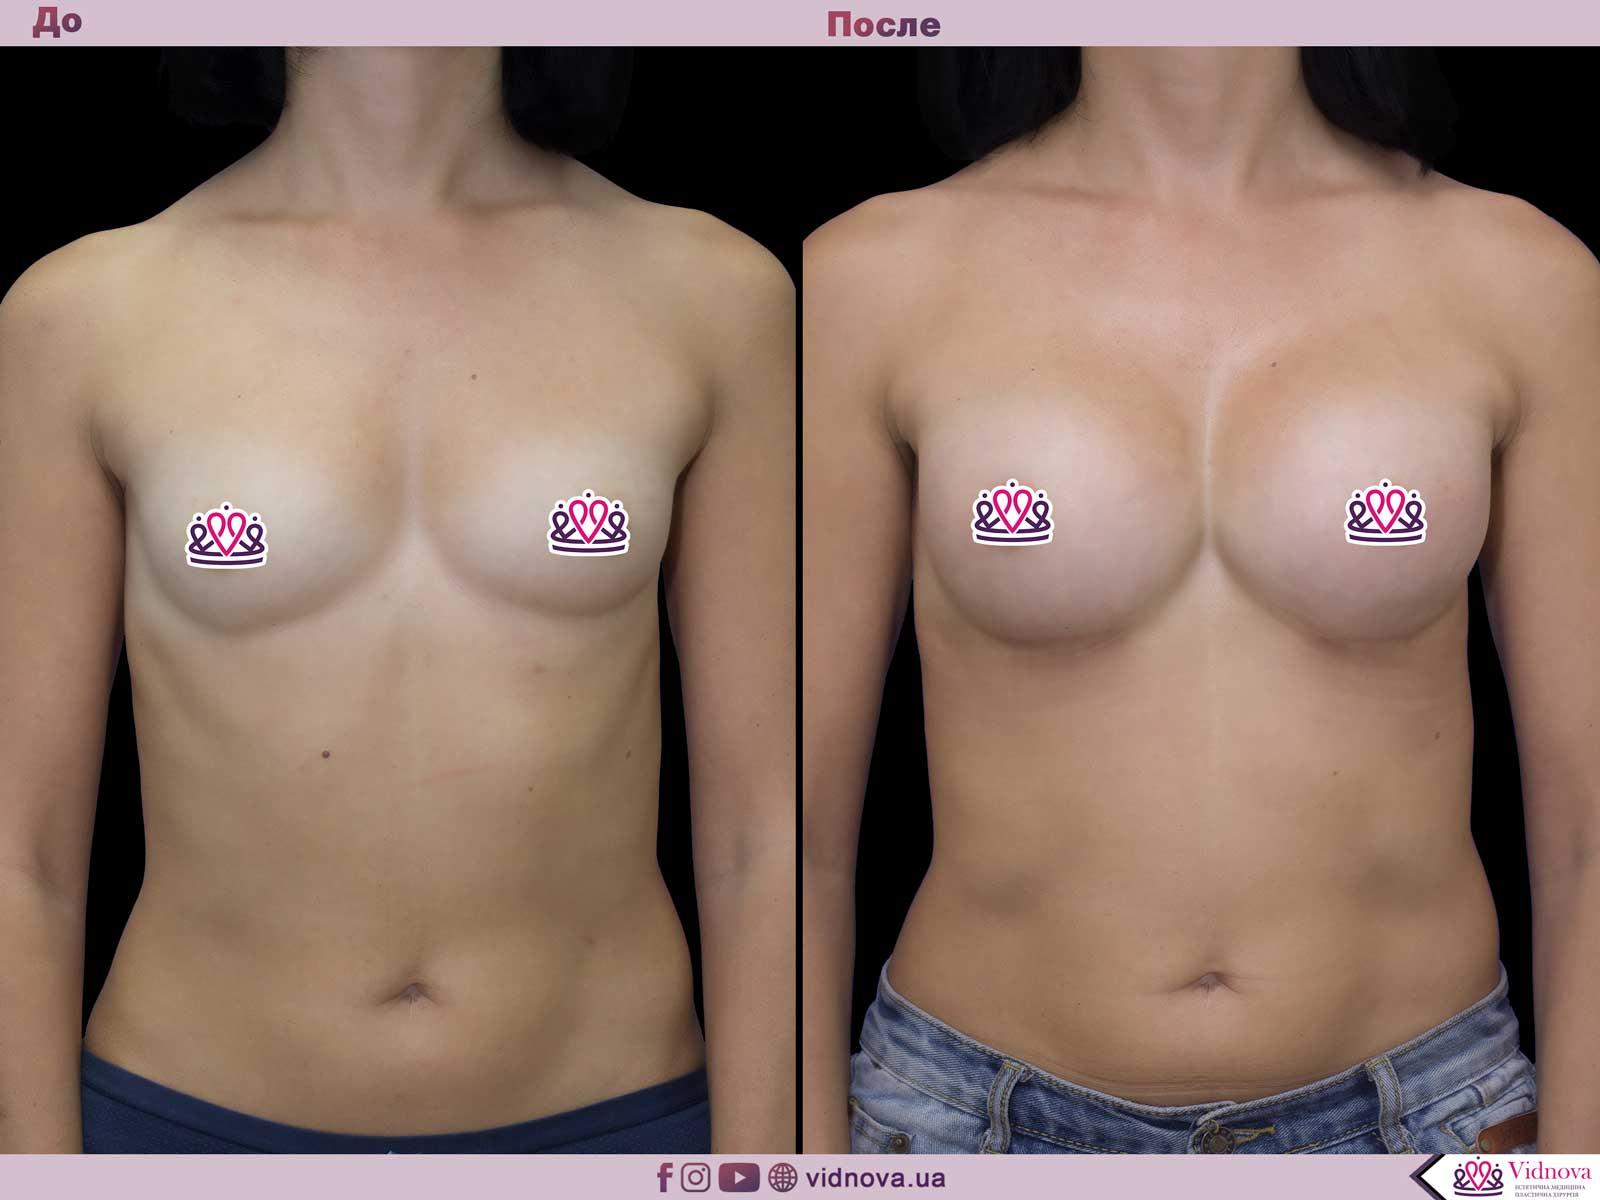 Увеличение груди: Фото ДО и ПОСЛЕ - Пример №48-1 - Клиника Vidnova